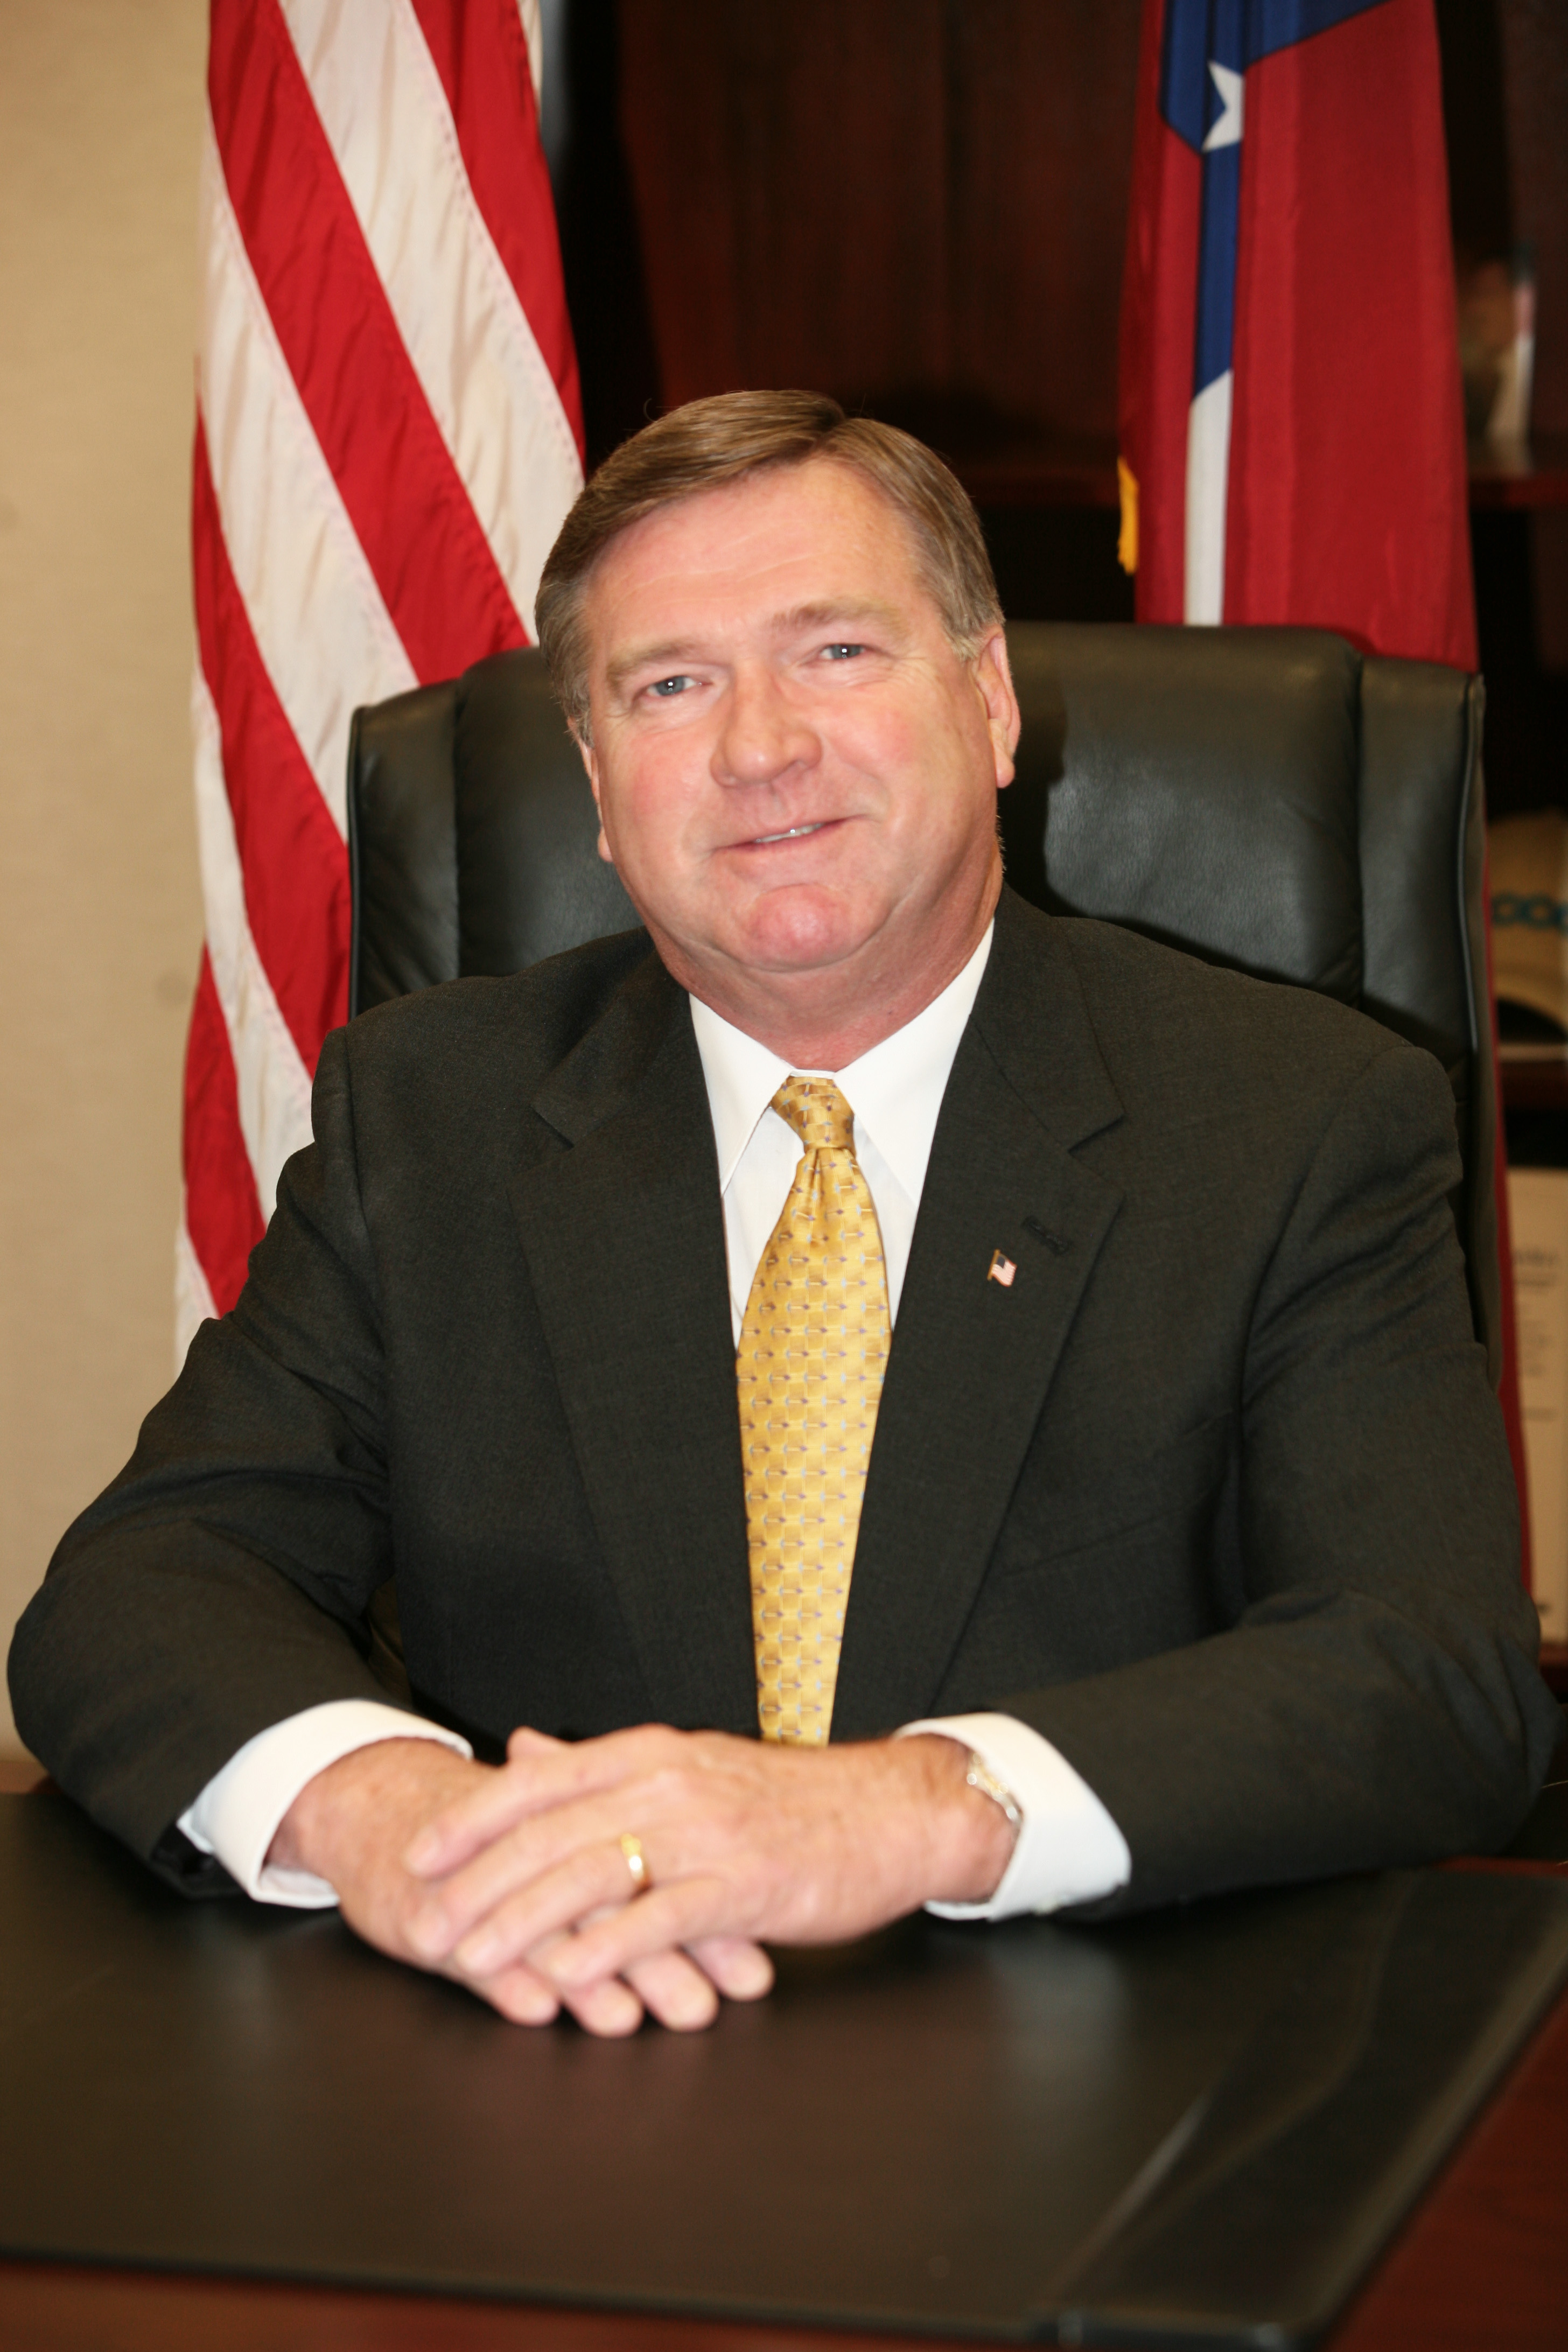 District 3 Commissioner - Mark Wisenbaker